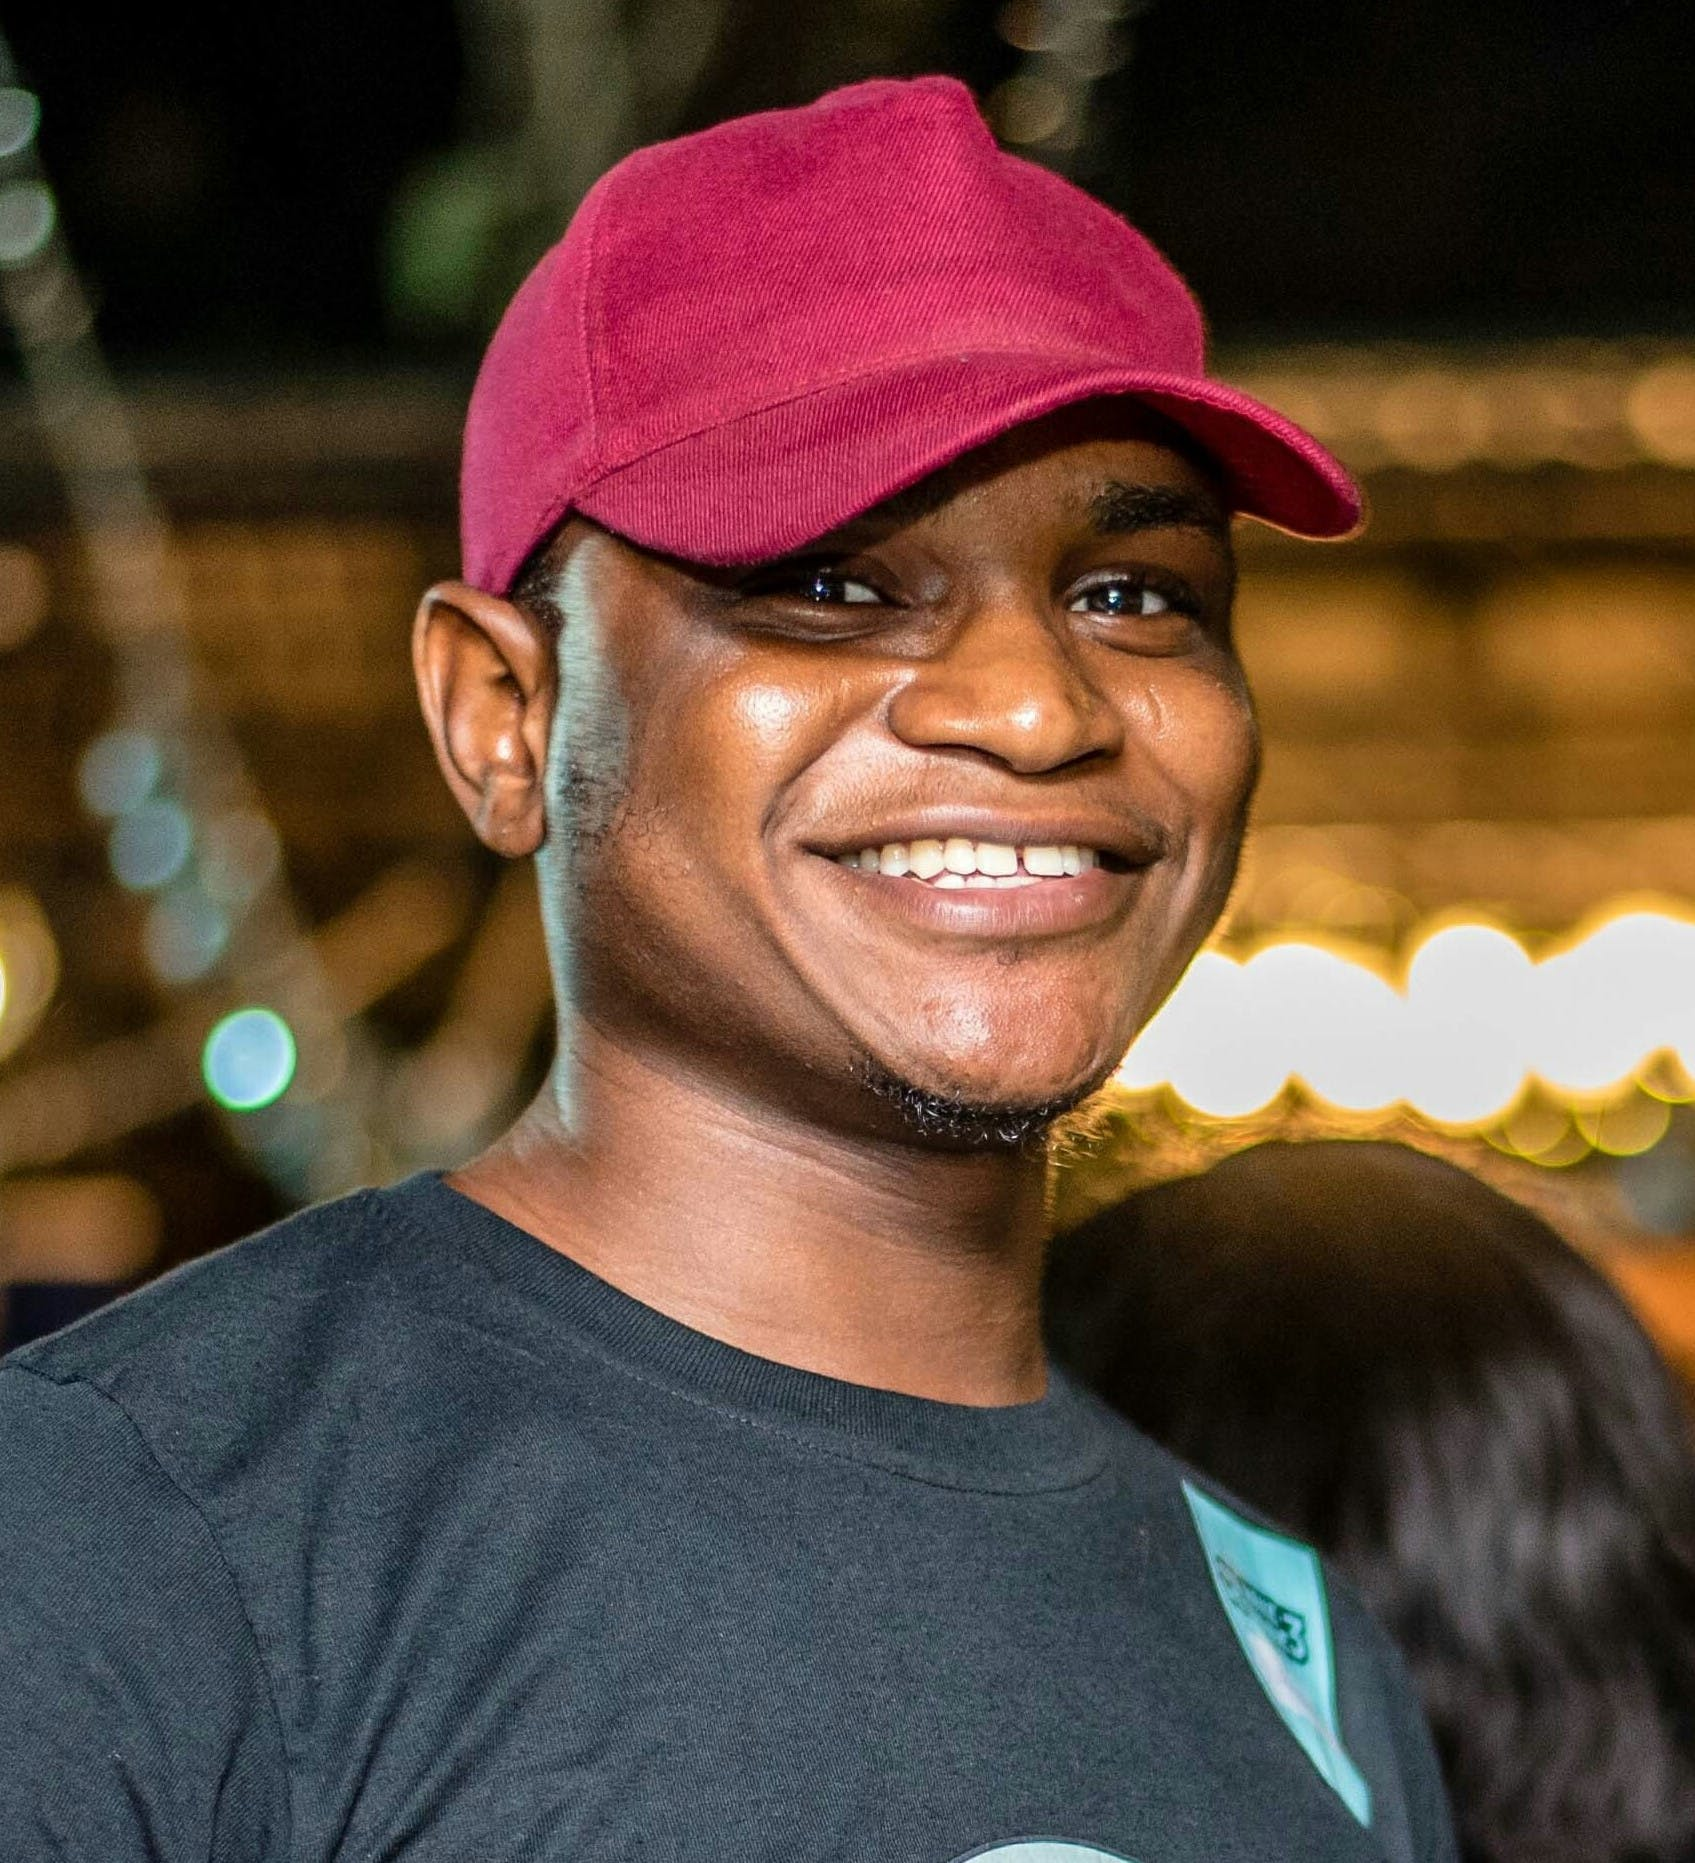 Idris Olubisi